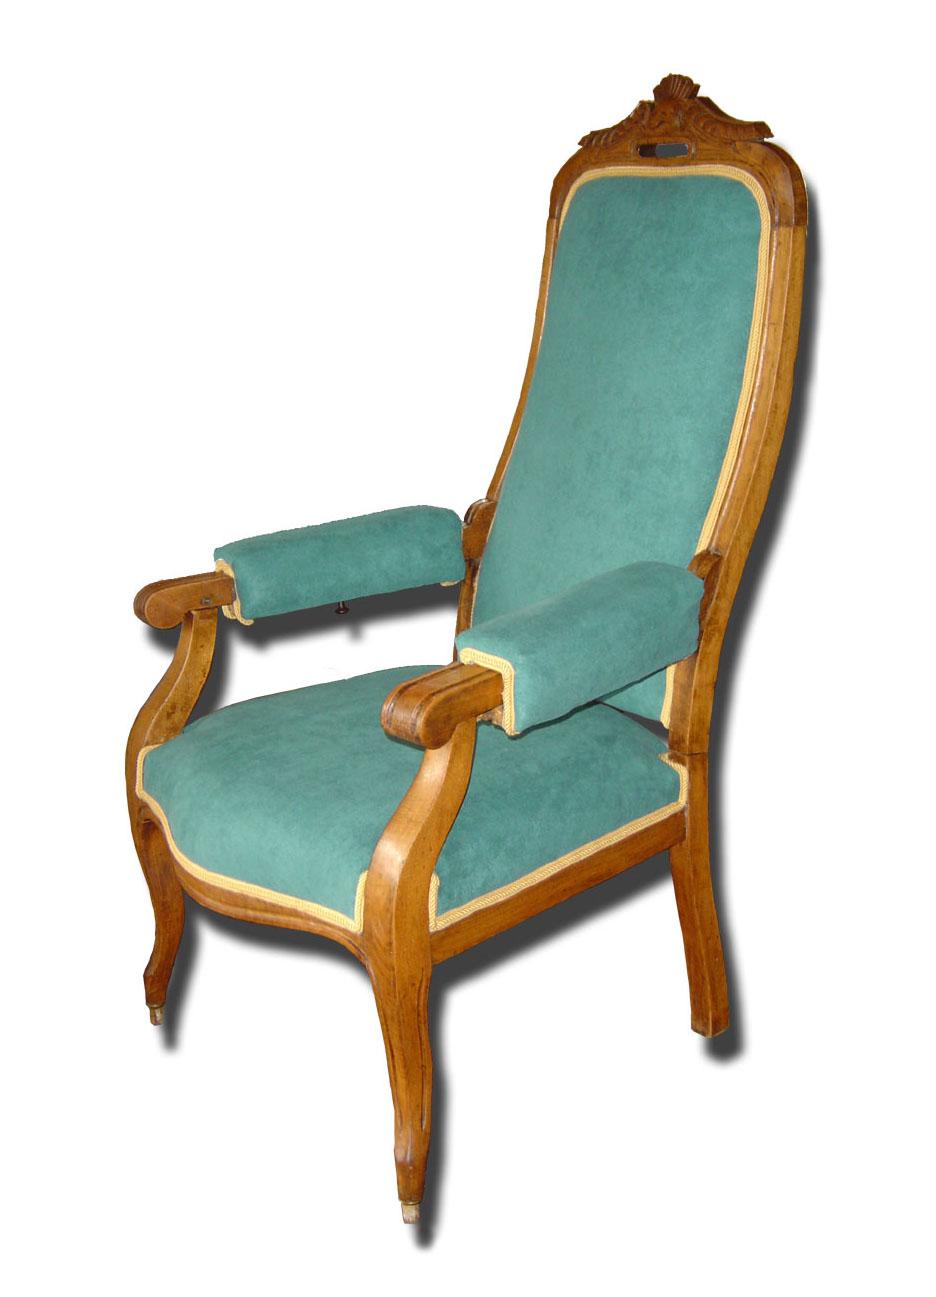 Grote Comfortabele Fauteuil.Voltaire Zetel Wikipedia